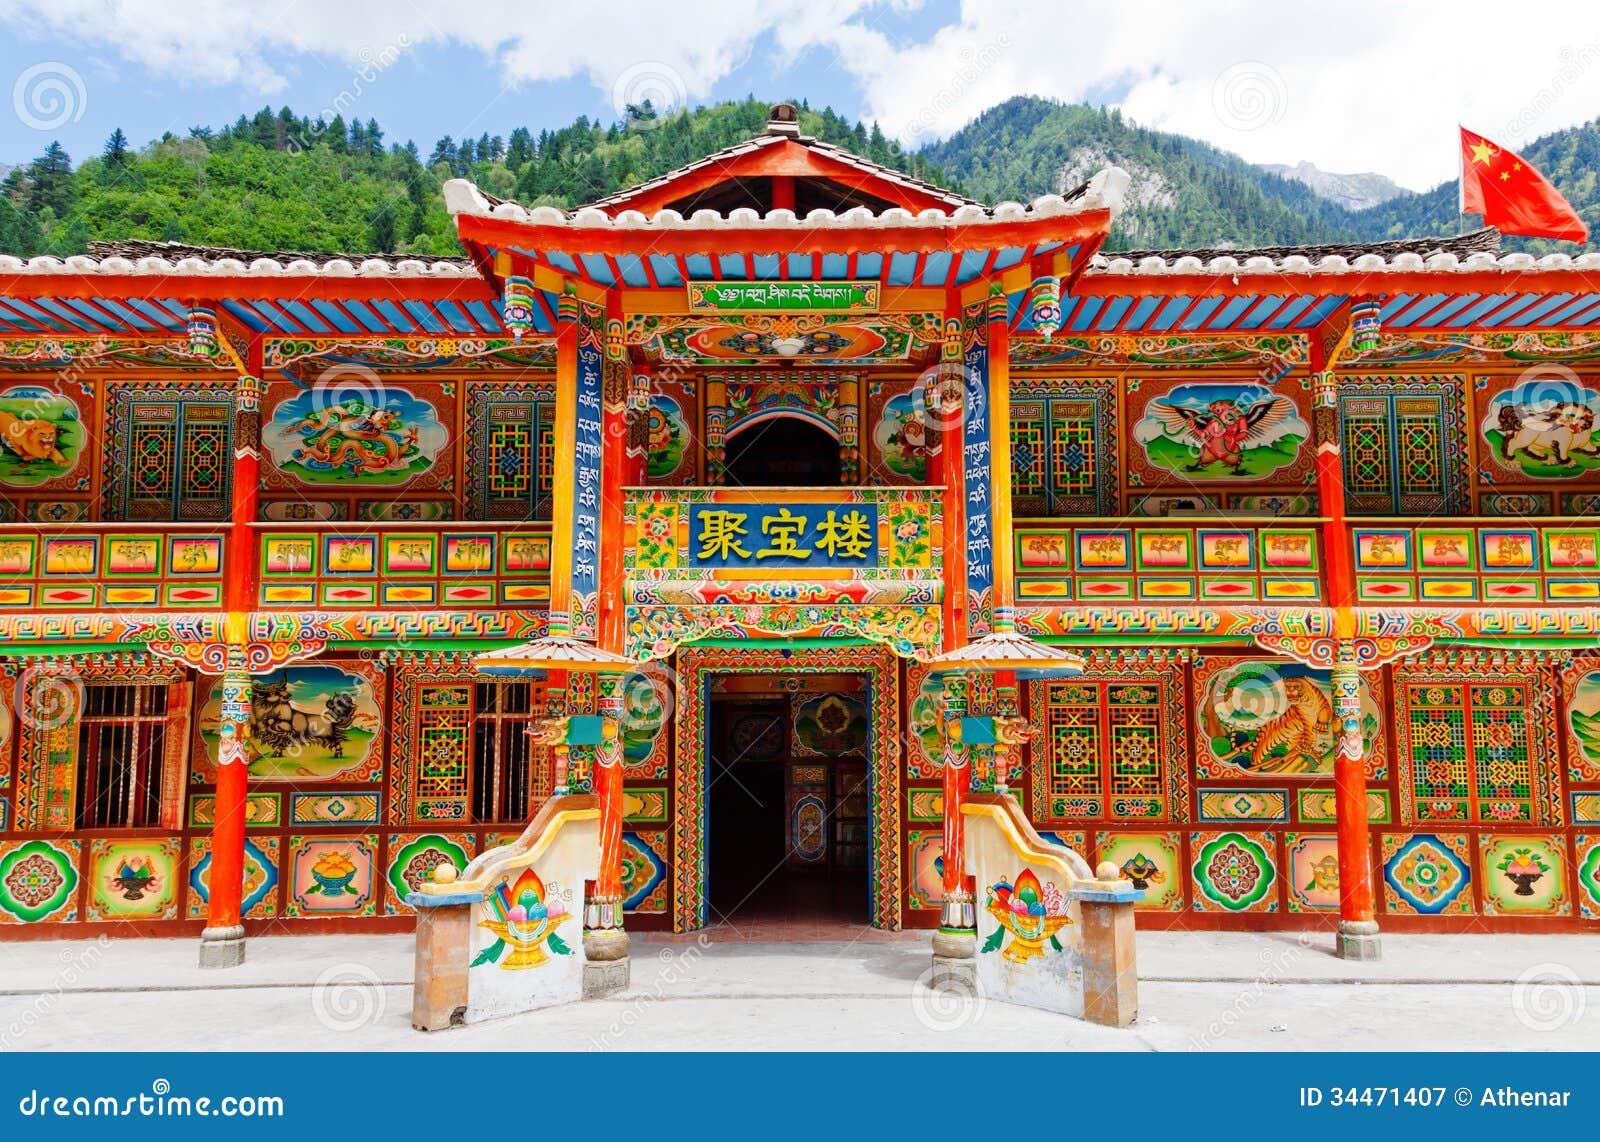 House Exterior Design India Tibetan Houses Royalty Free Stock Photography Image